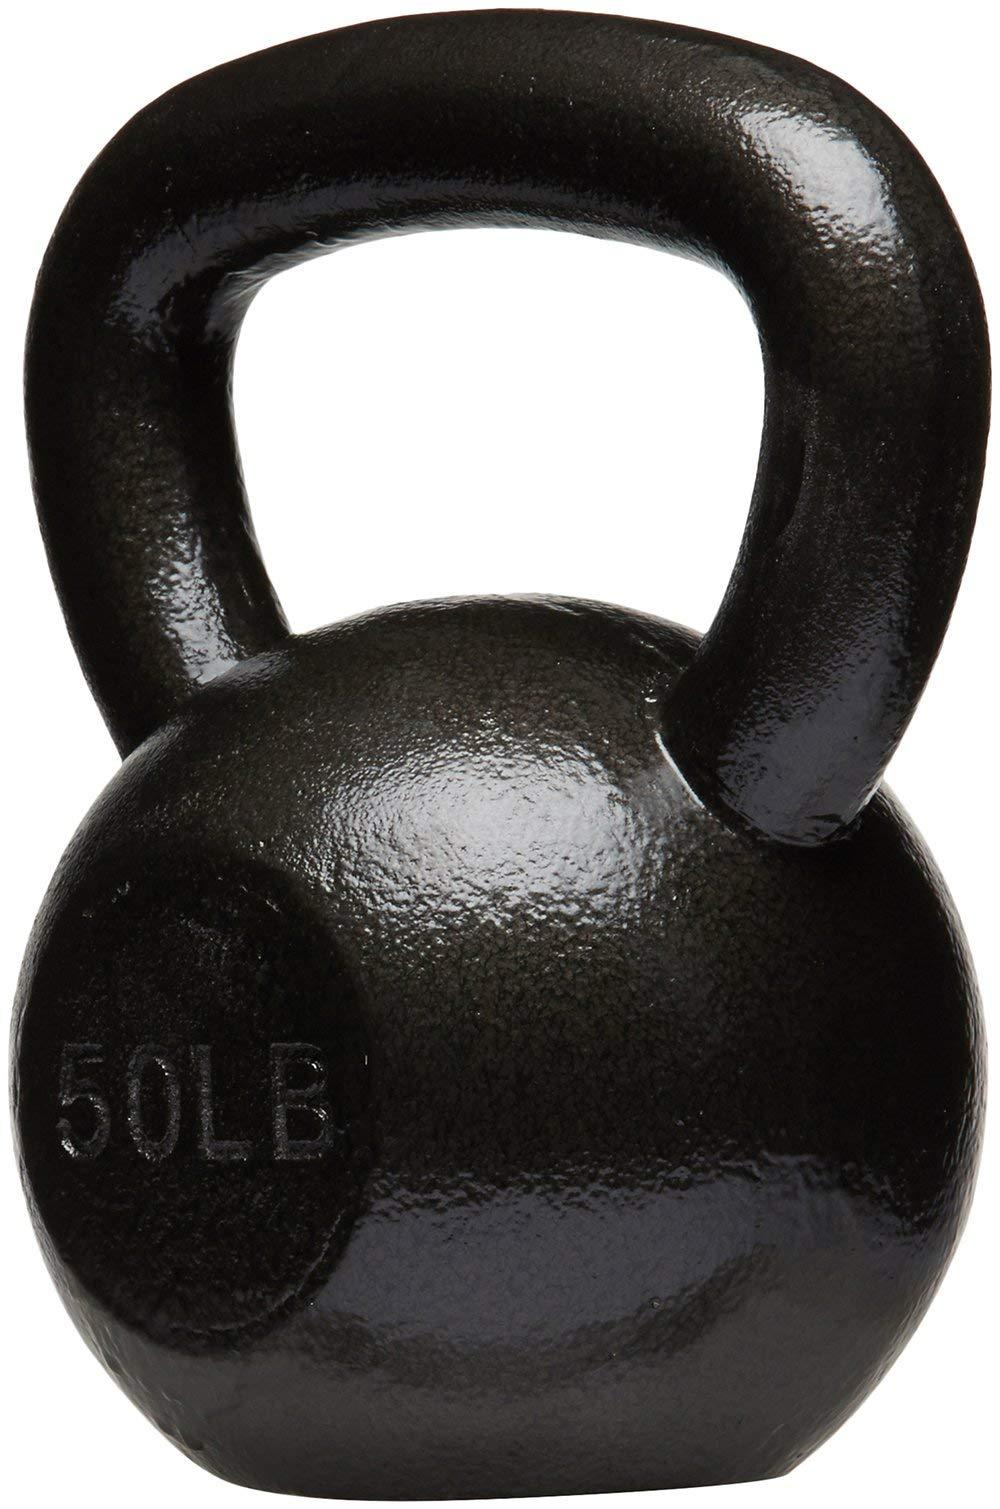 AmazonBasics Cast Iron Kettlebell, 50 lb by AmazonBasics (Image #2)